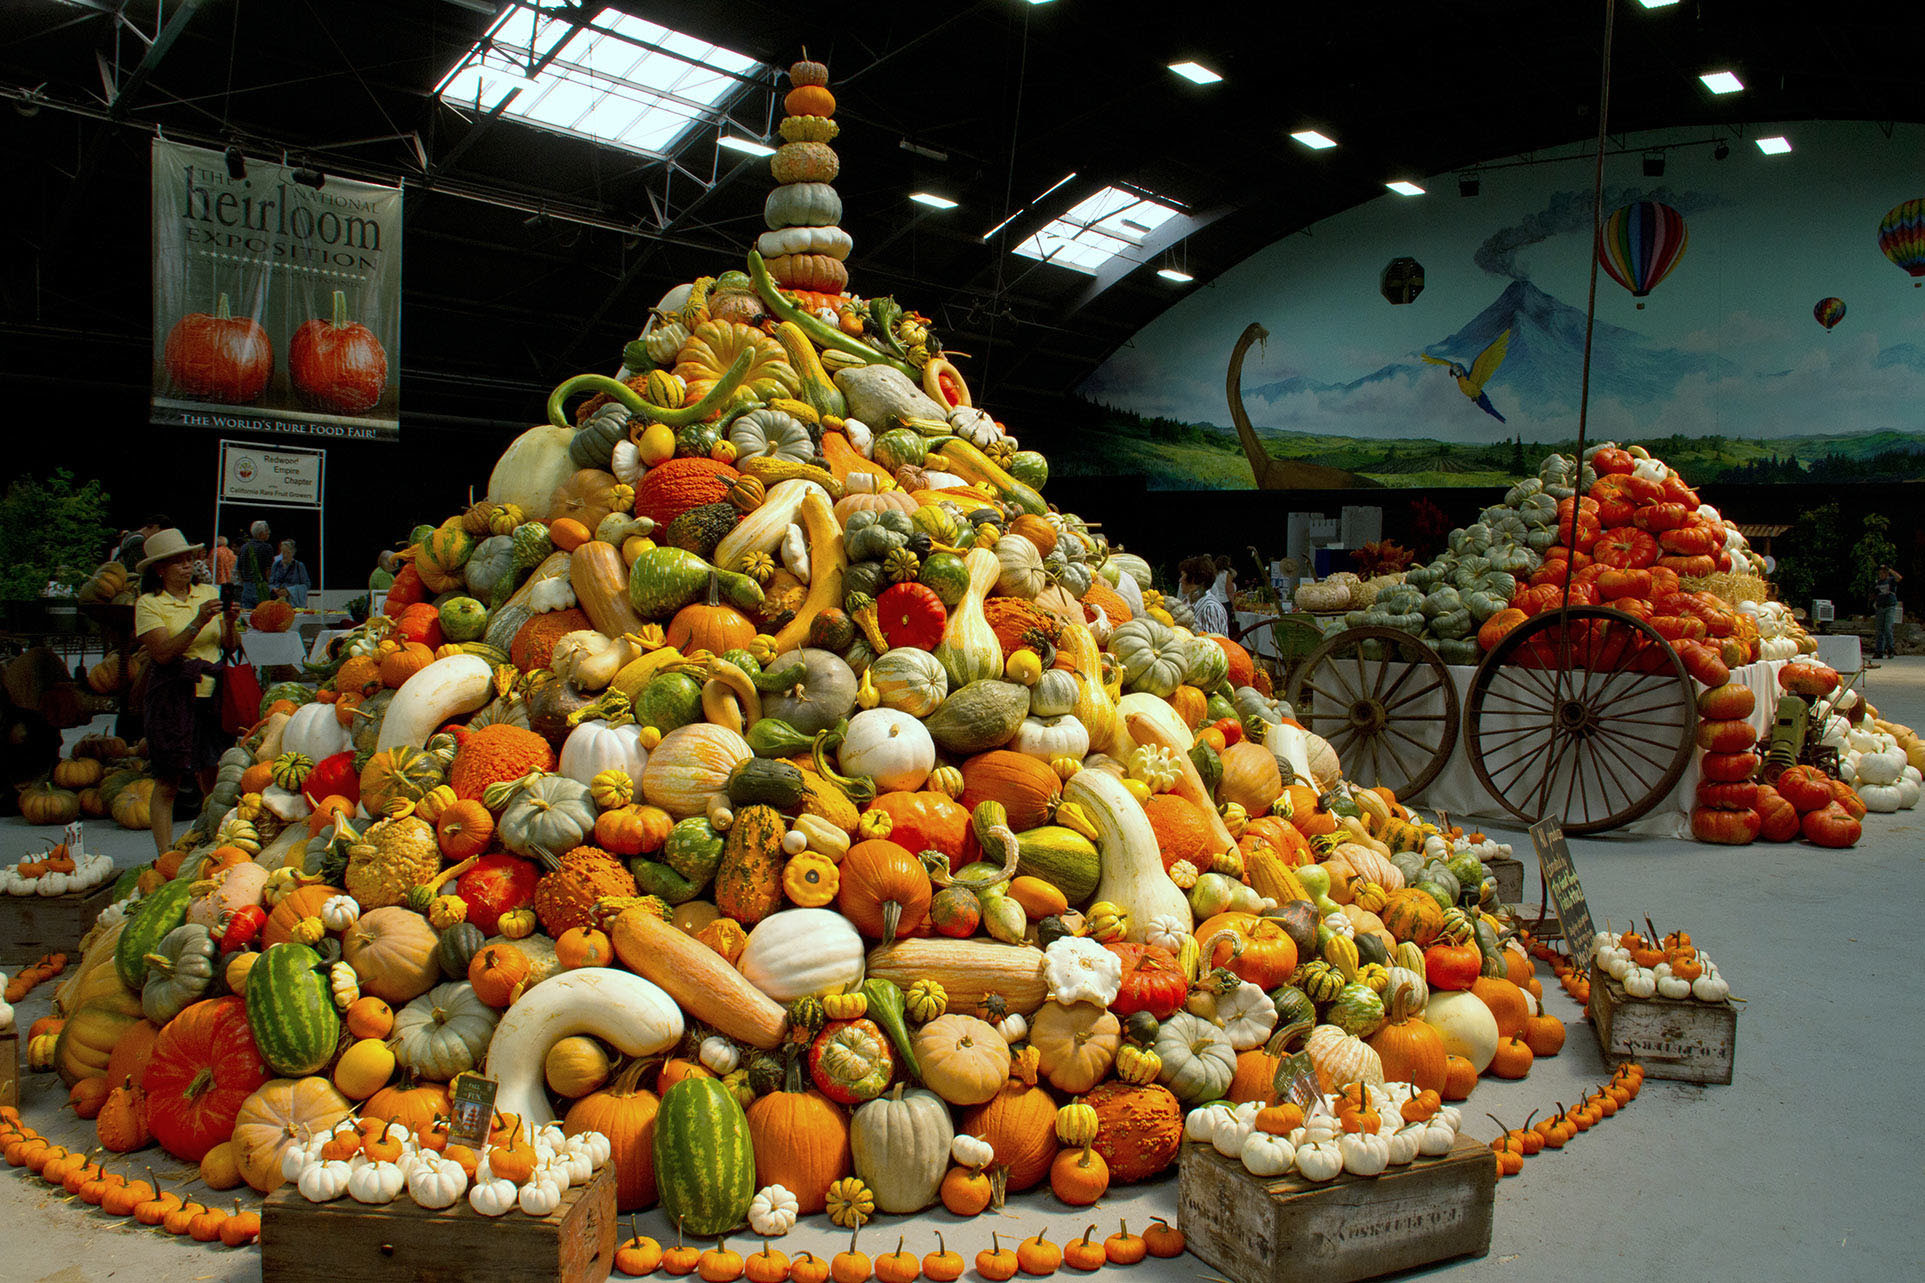 National Heirloom Exposition Veggie Pyramid!